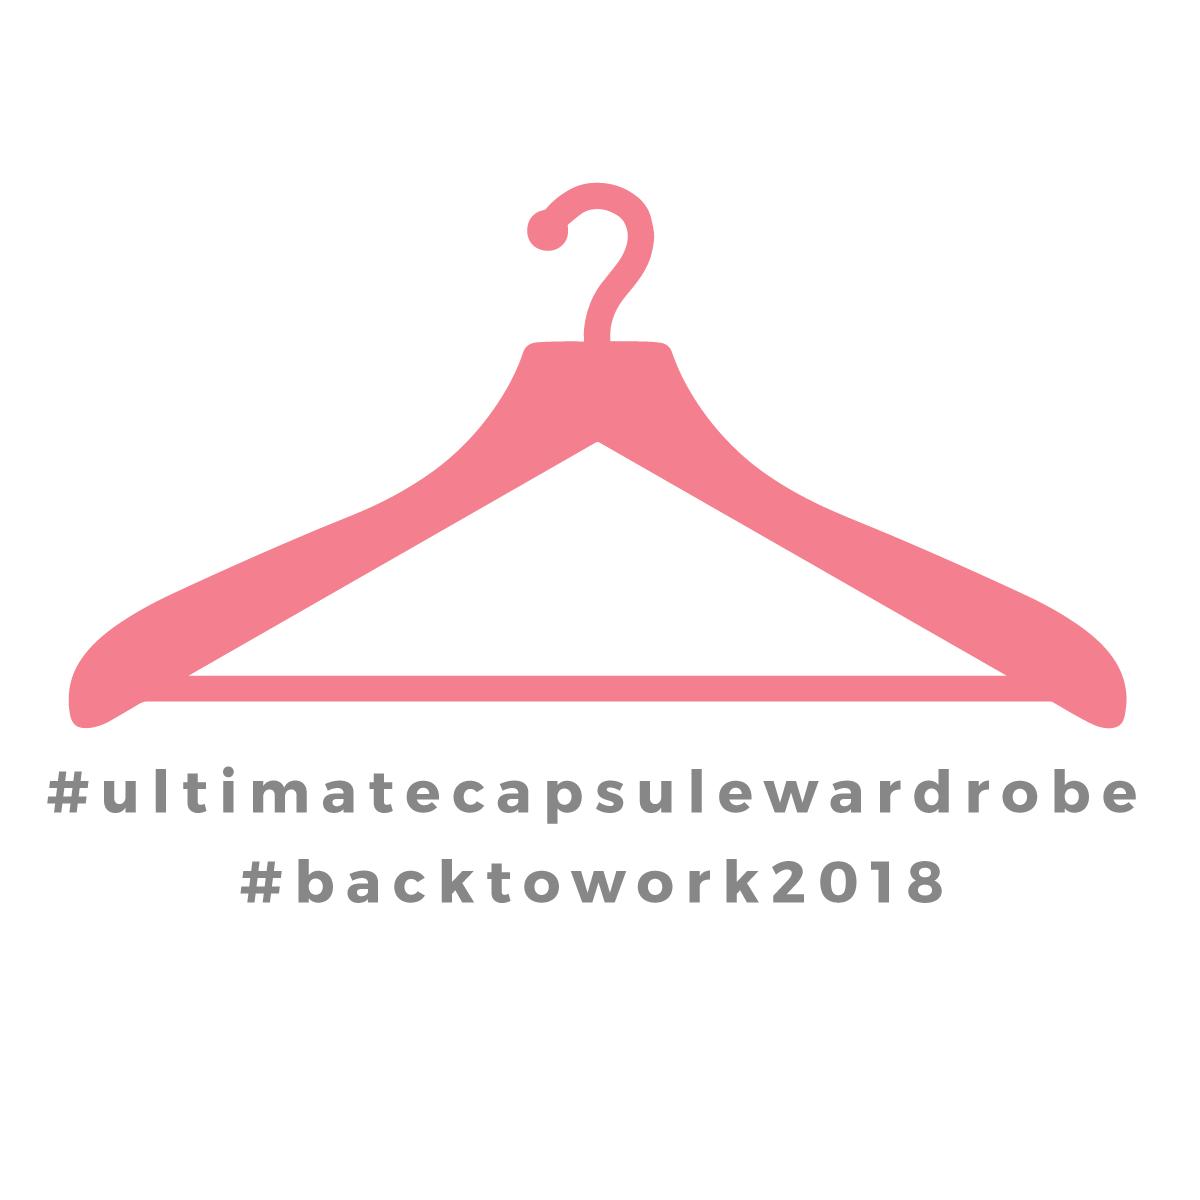 Rediscover your wardrobe mojo: Back to Work 2018 Ultimate Capsule Wardrobe program | Styling You